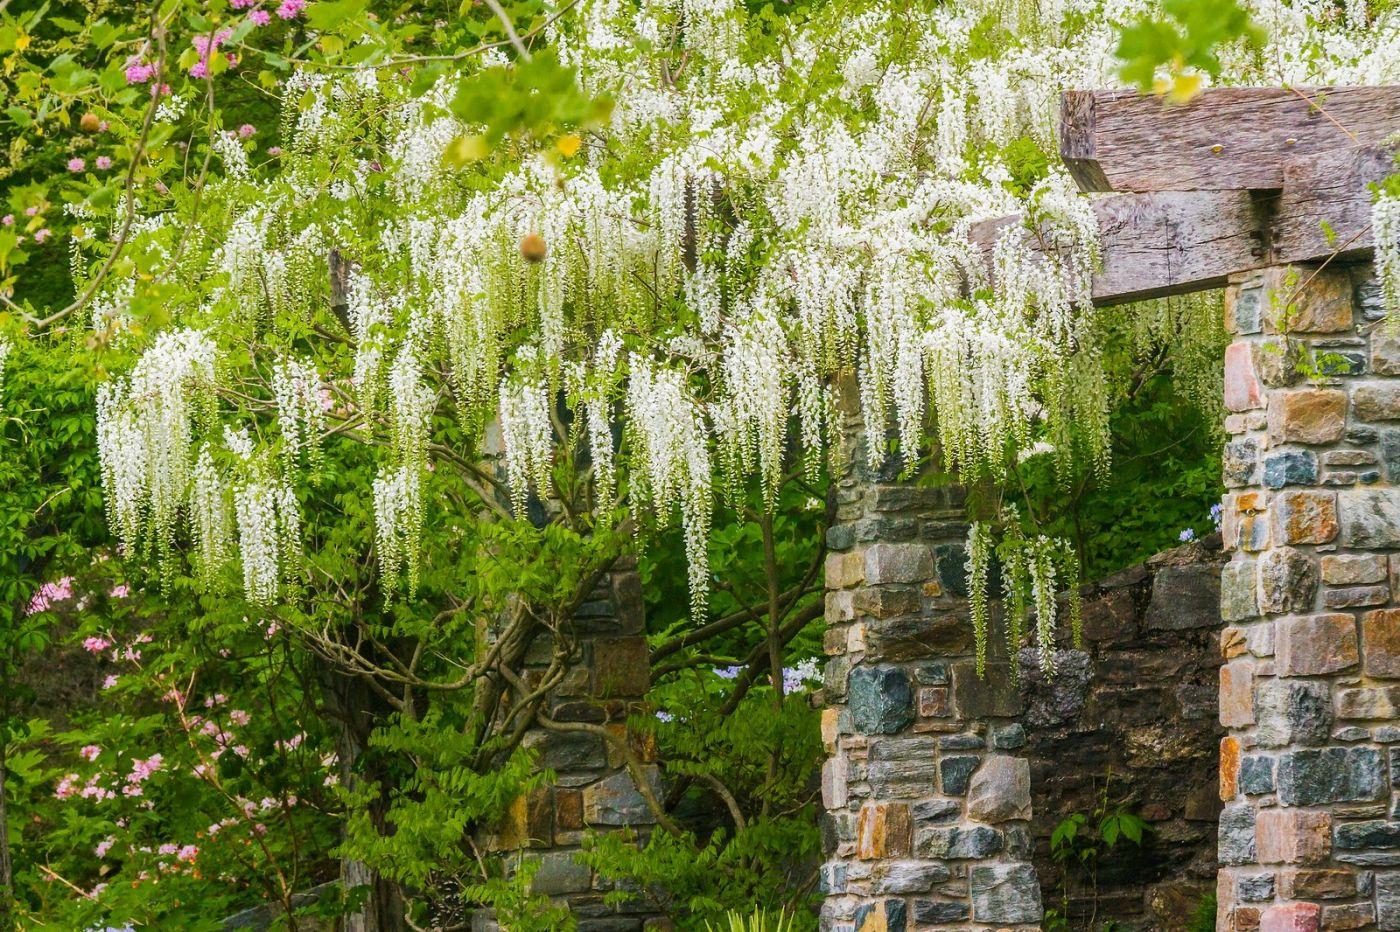 Chanticleer花园,那年盛开的紫藤花_图1-25